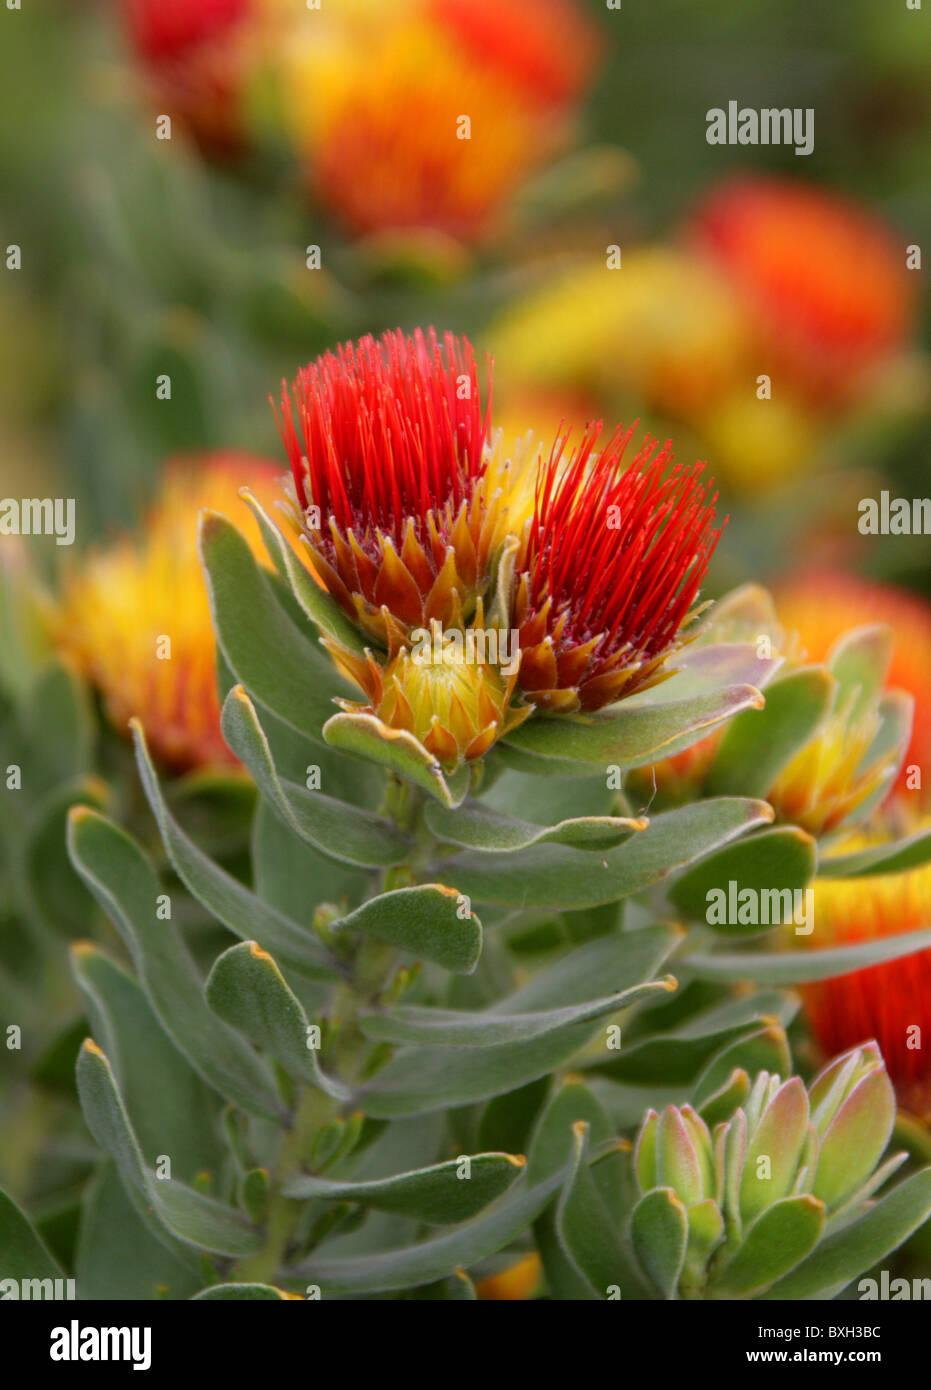 Tufted Pincushion Protea, Leucospermum oleifolium, Proteaceae. Mountain Fynbos, Western Cape, South Africa. Stock Photo